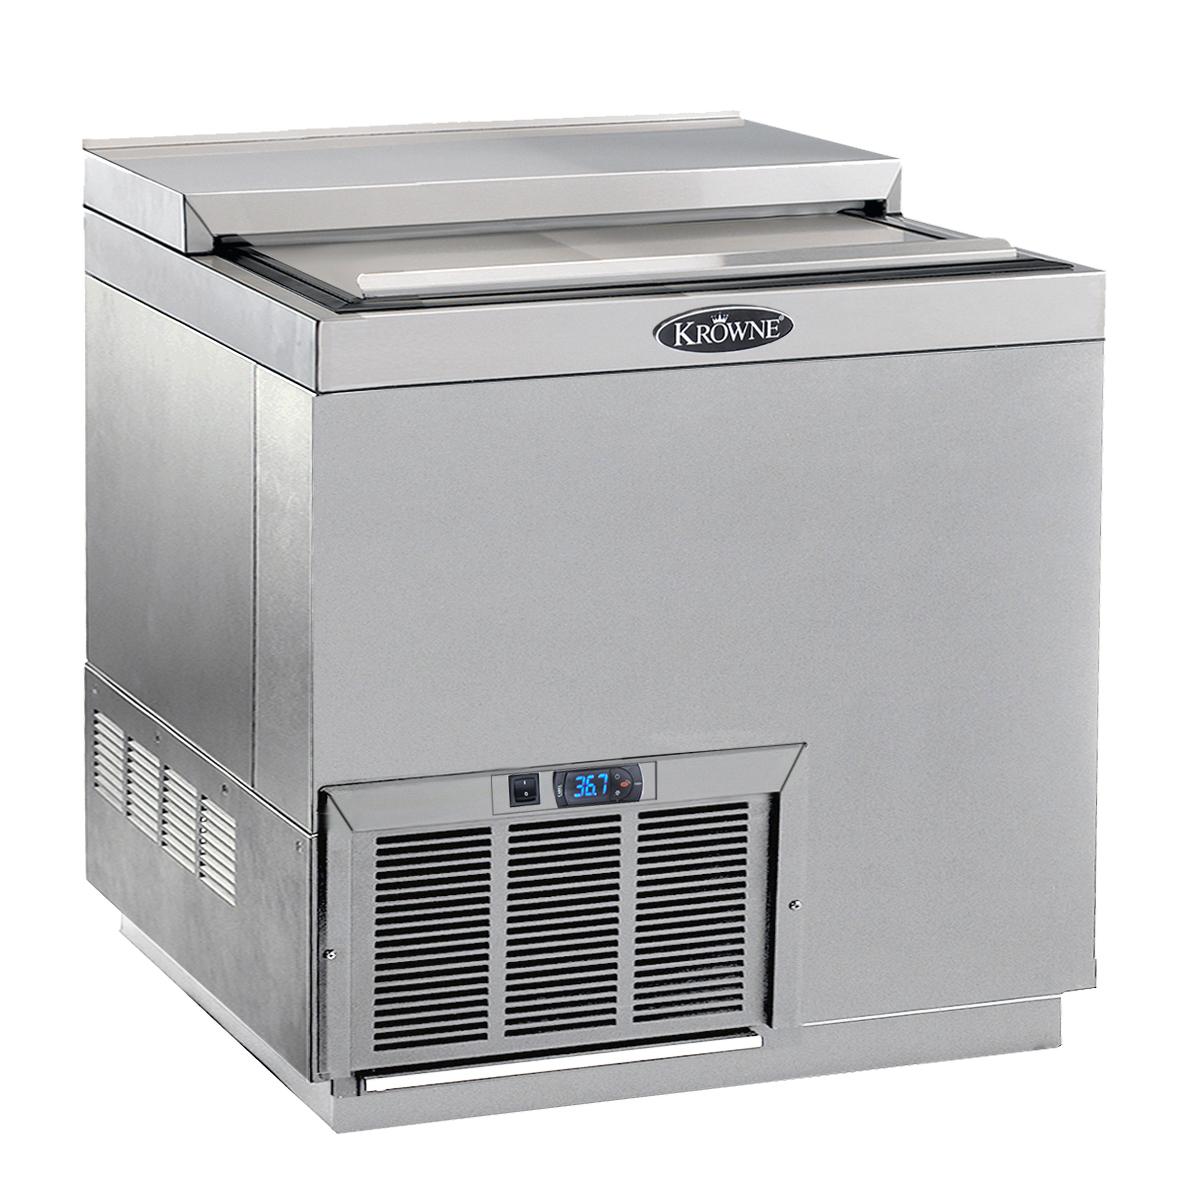 Krowne Metal BC36-SS refrigeration